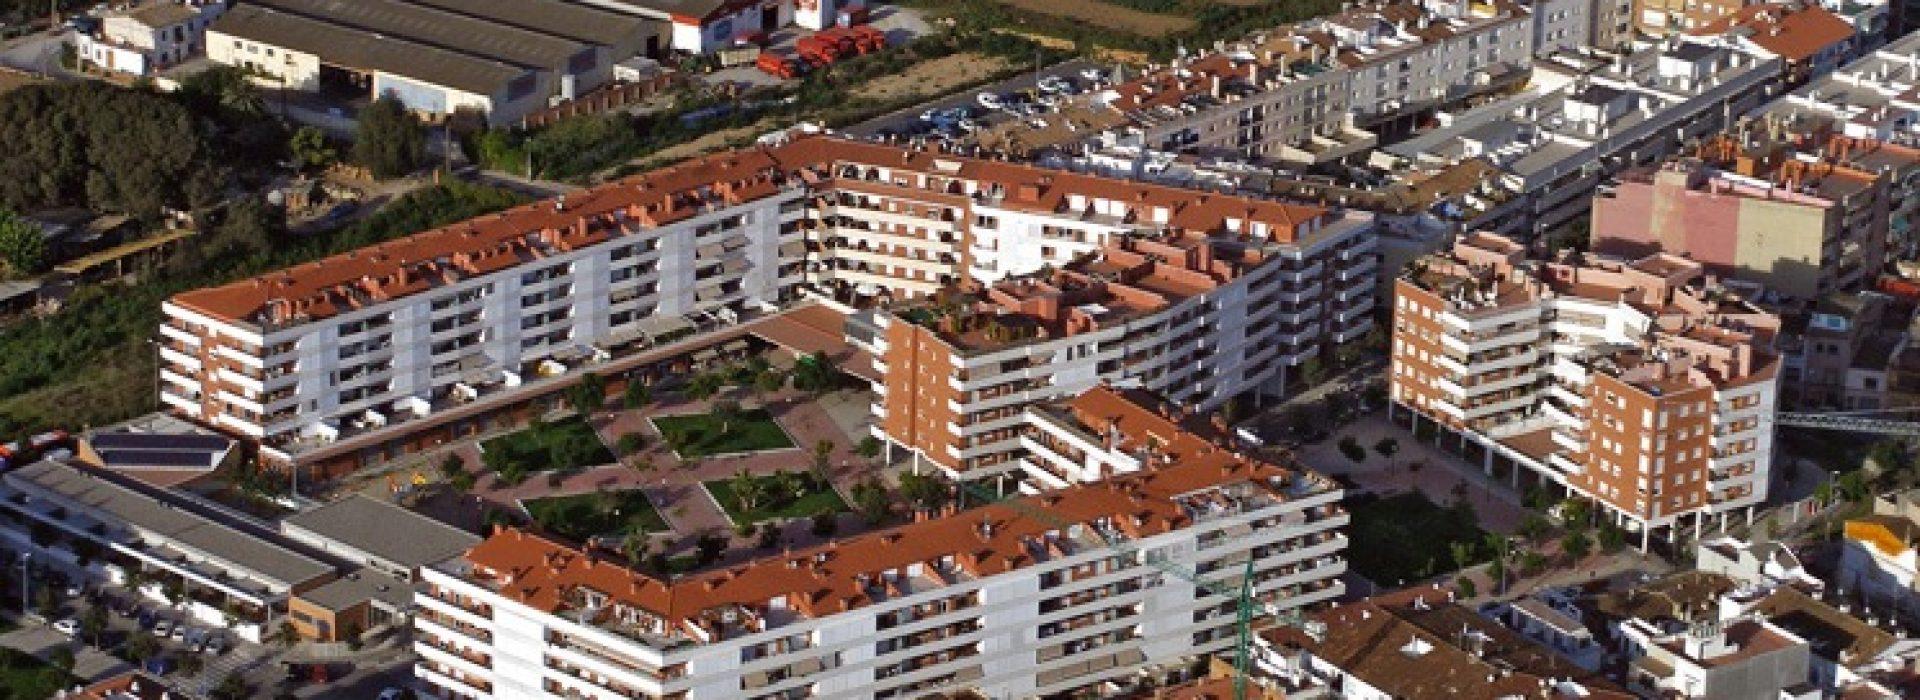 residencial-fisa-01-1